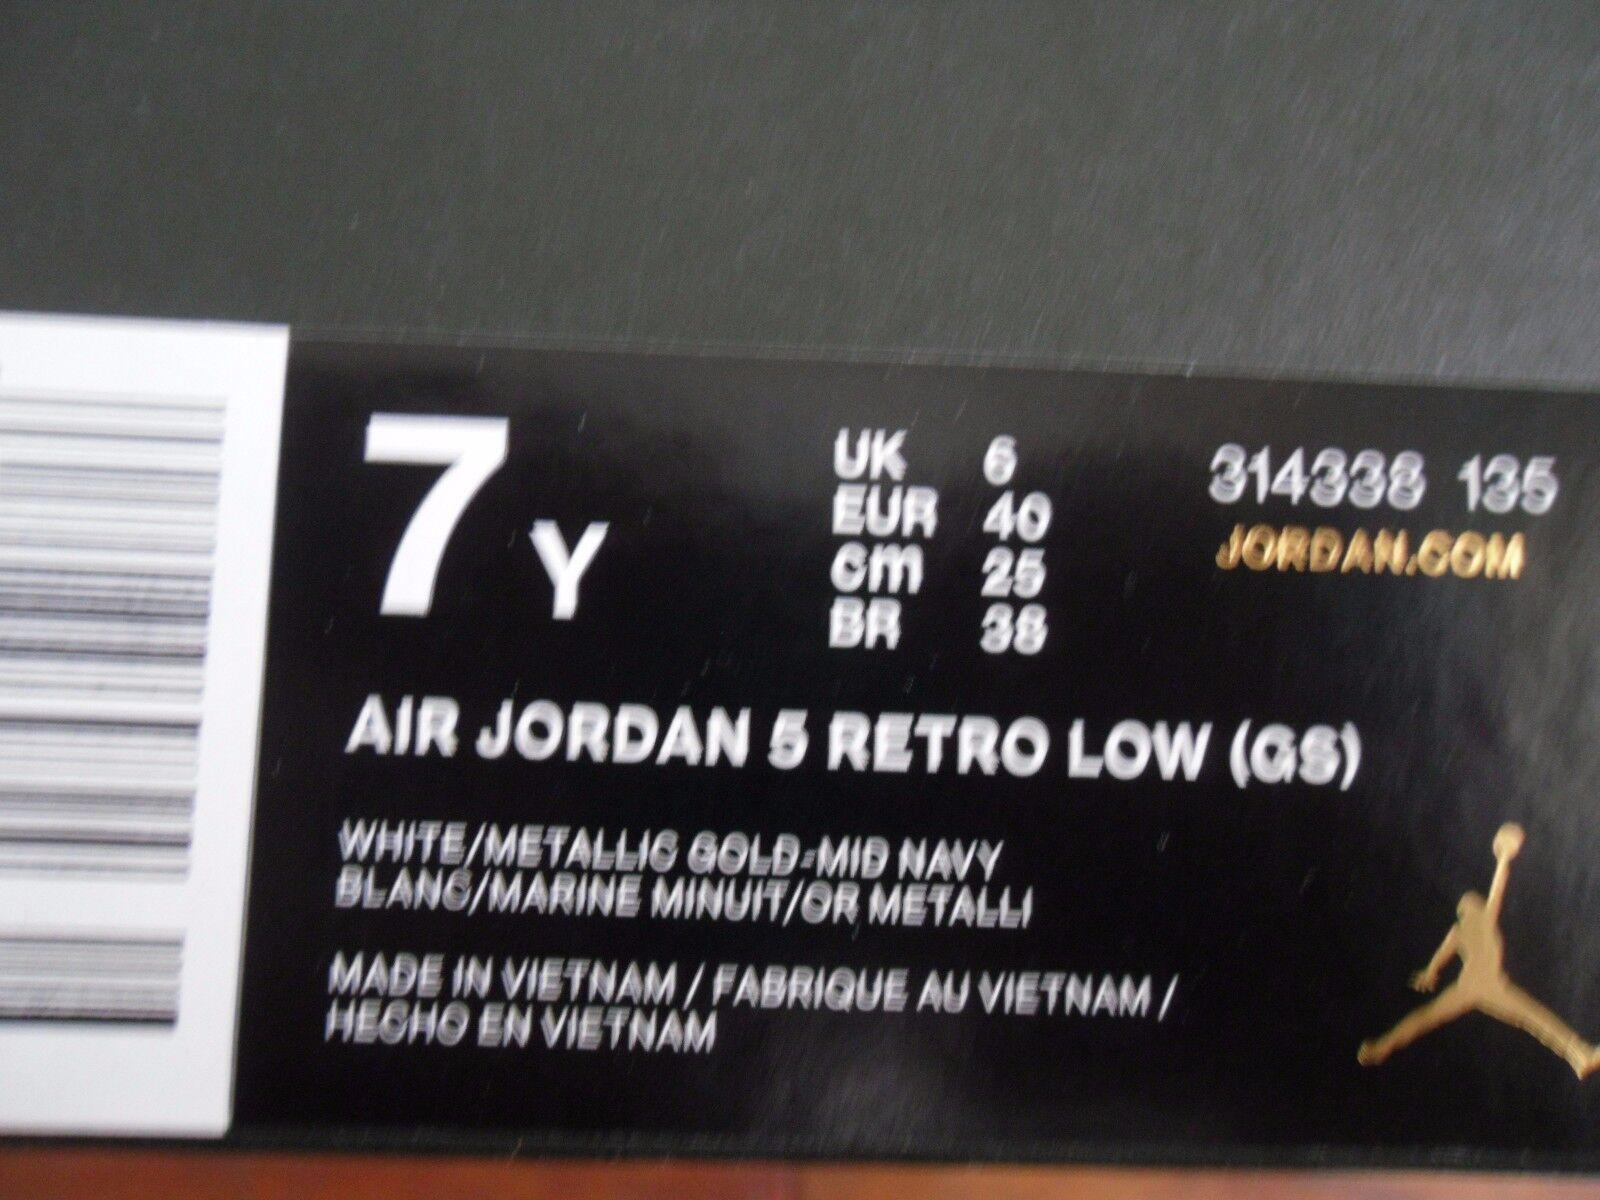 NIKE AIR JORDAN 5 RETRO LOW (GS) (GS) (GS) DUNK FROM ABOVE SZ 7Y-WMNS SZ 8.5 7e5891